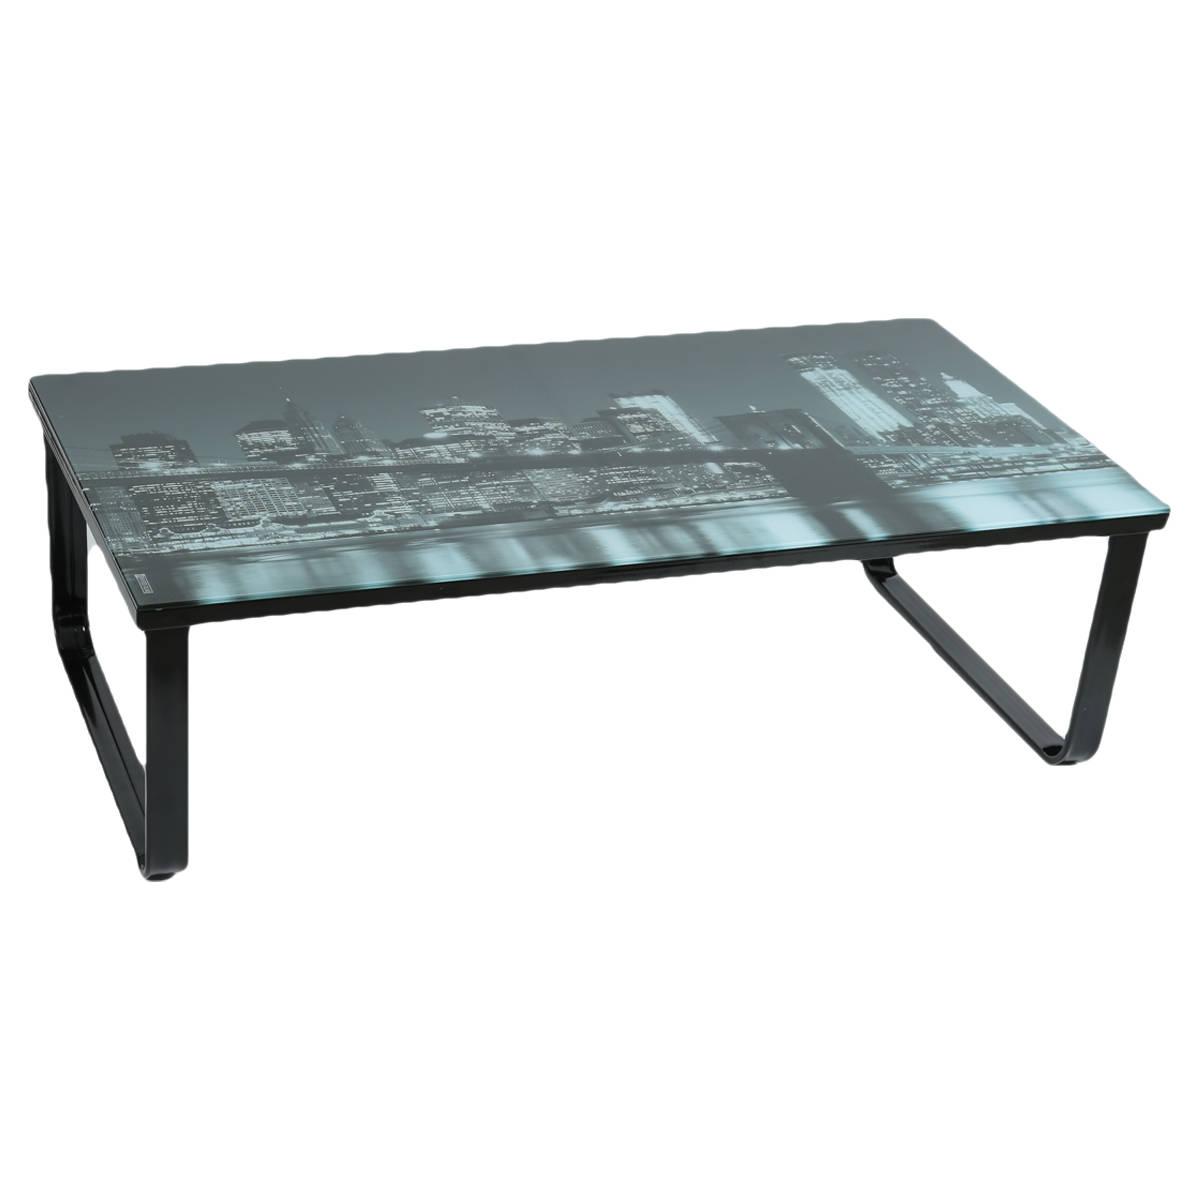 Nappe table basse gifi